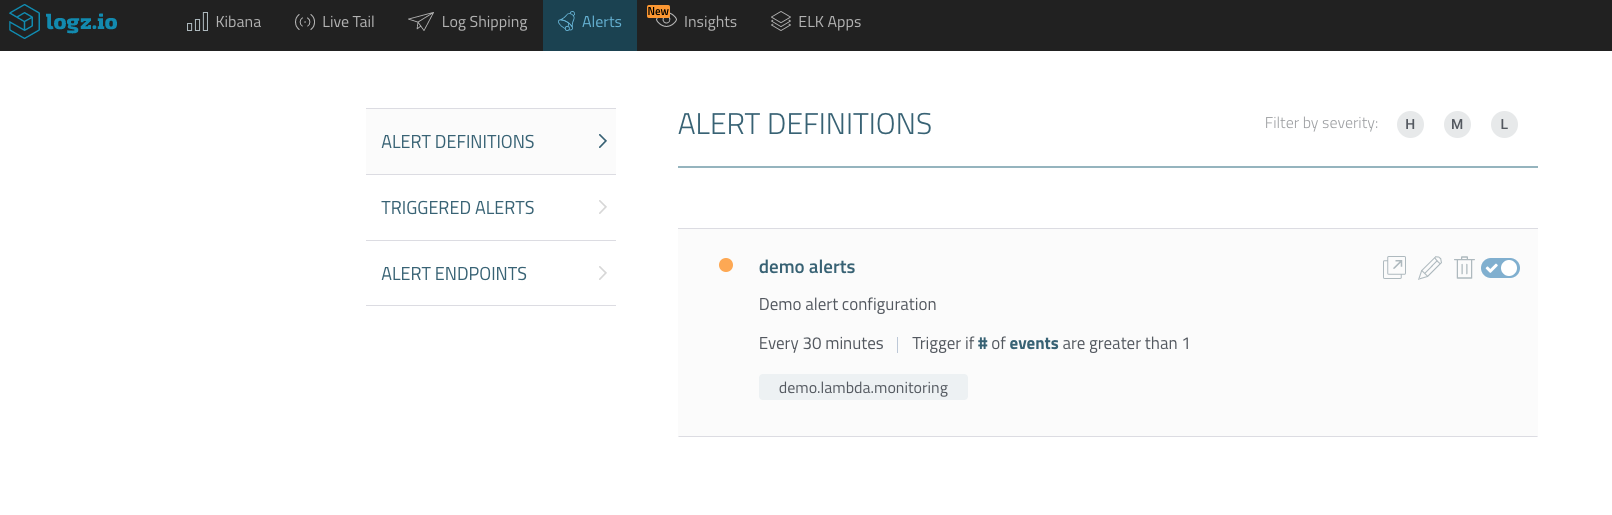 alert definitions